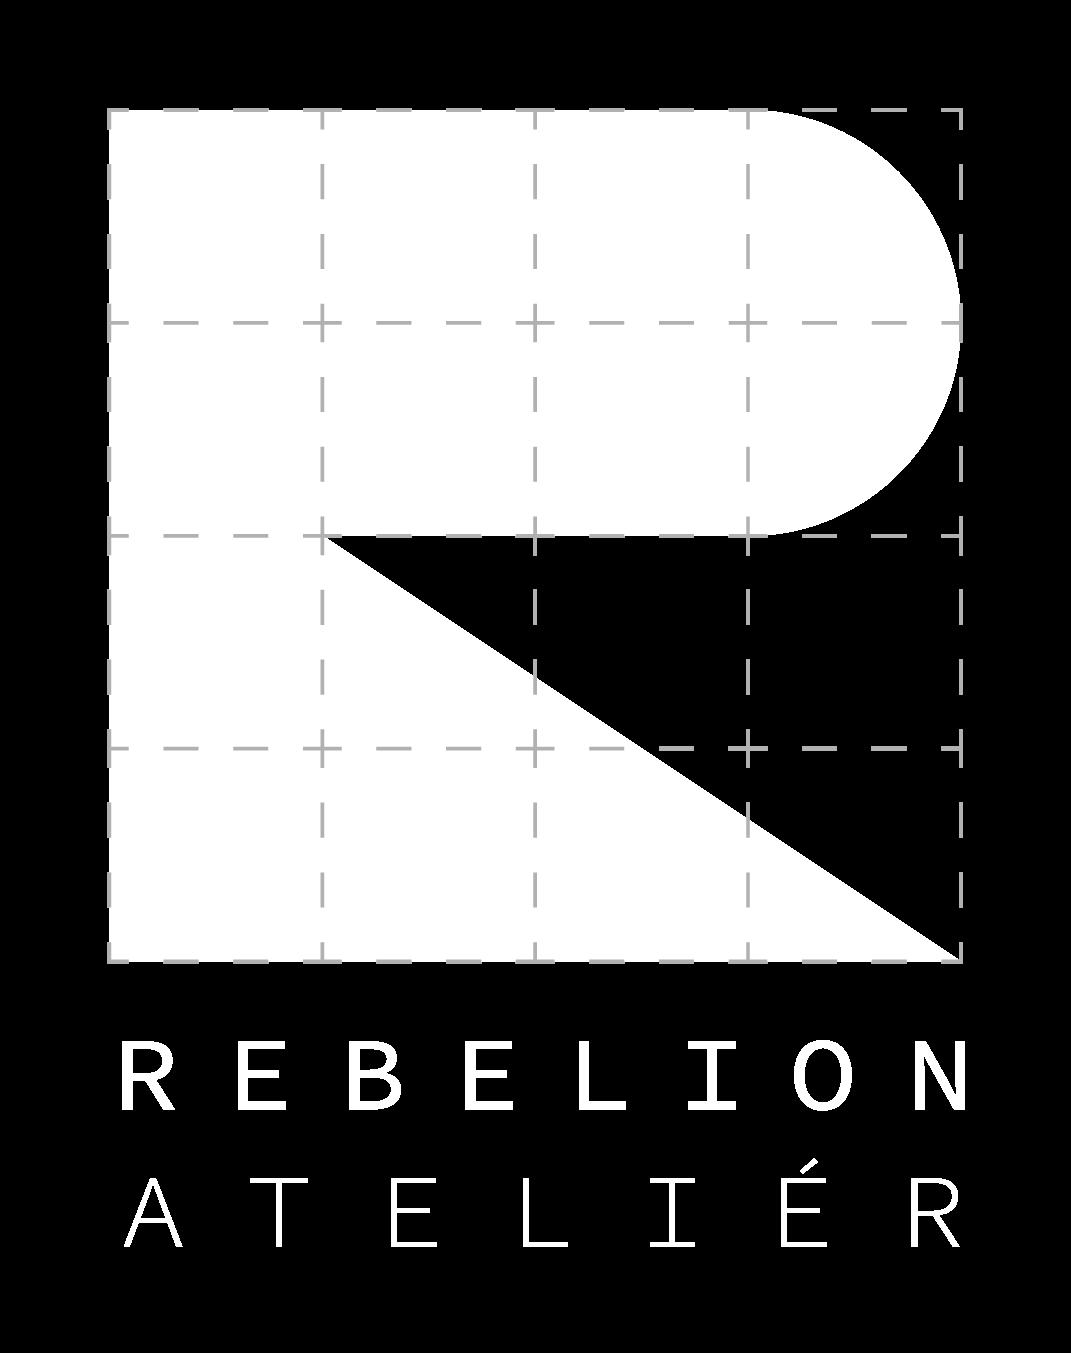 Rebelion ateliér